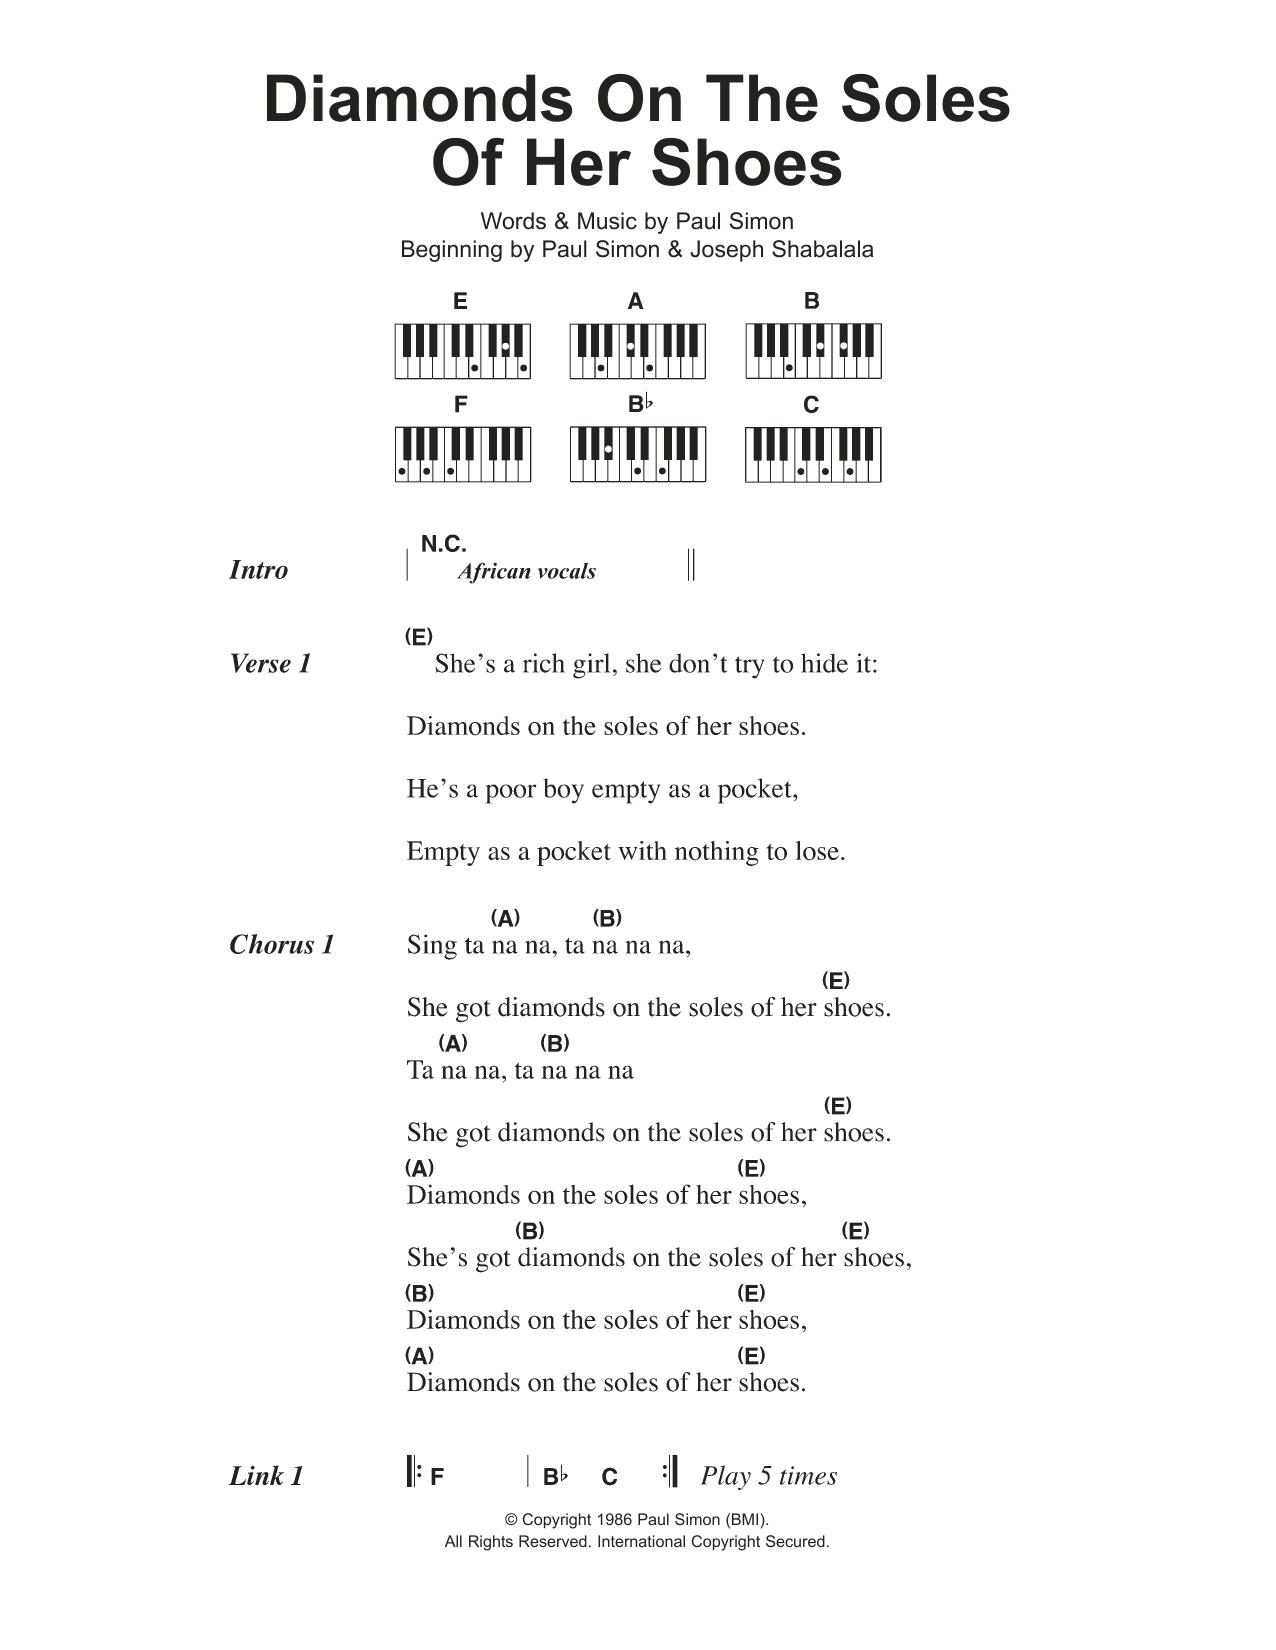 Diamonds On The Soles Of Her Shoes Paul Simon Lyrics Piano Chords